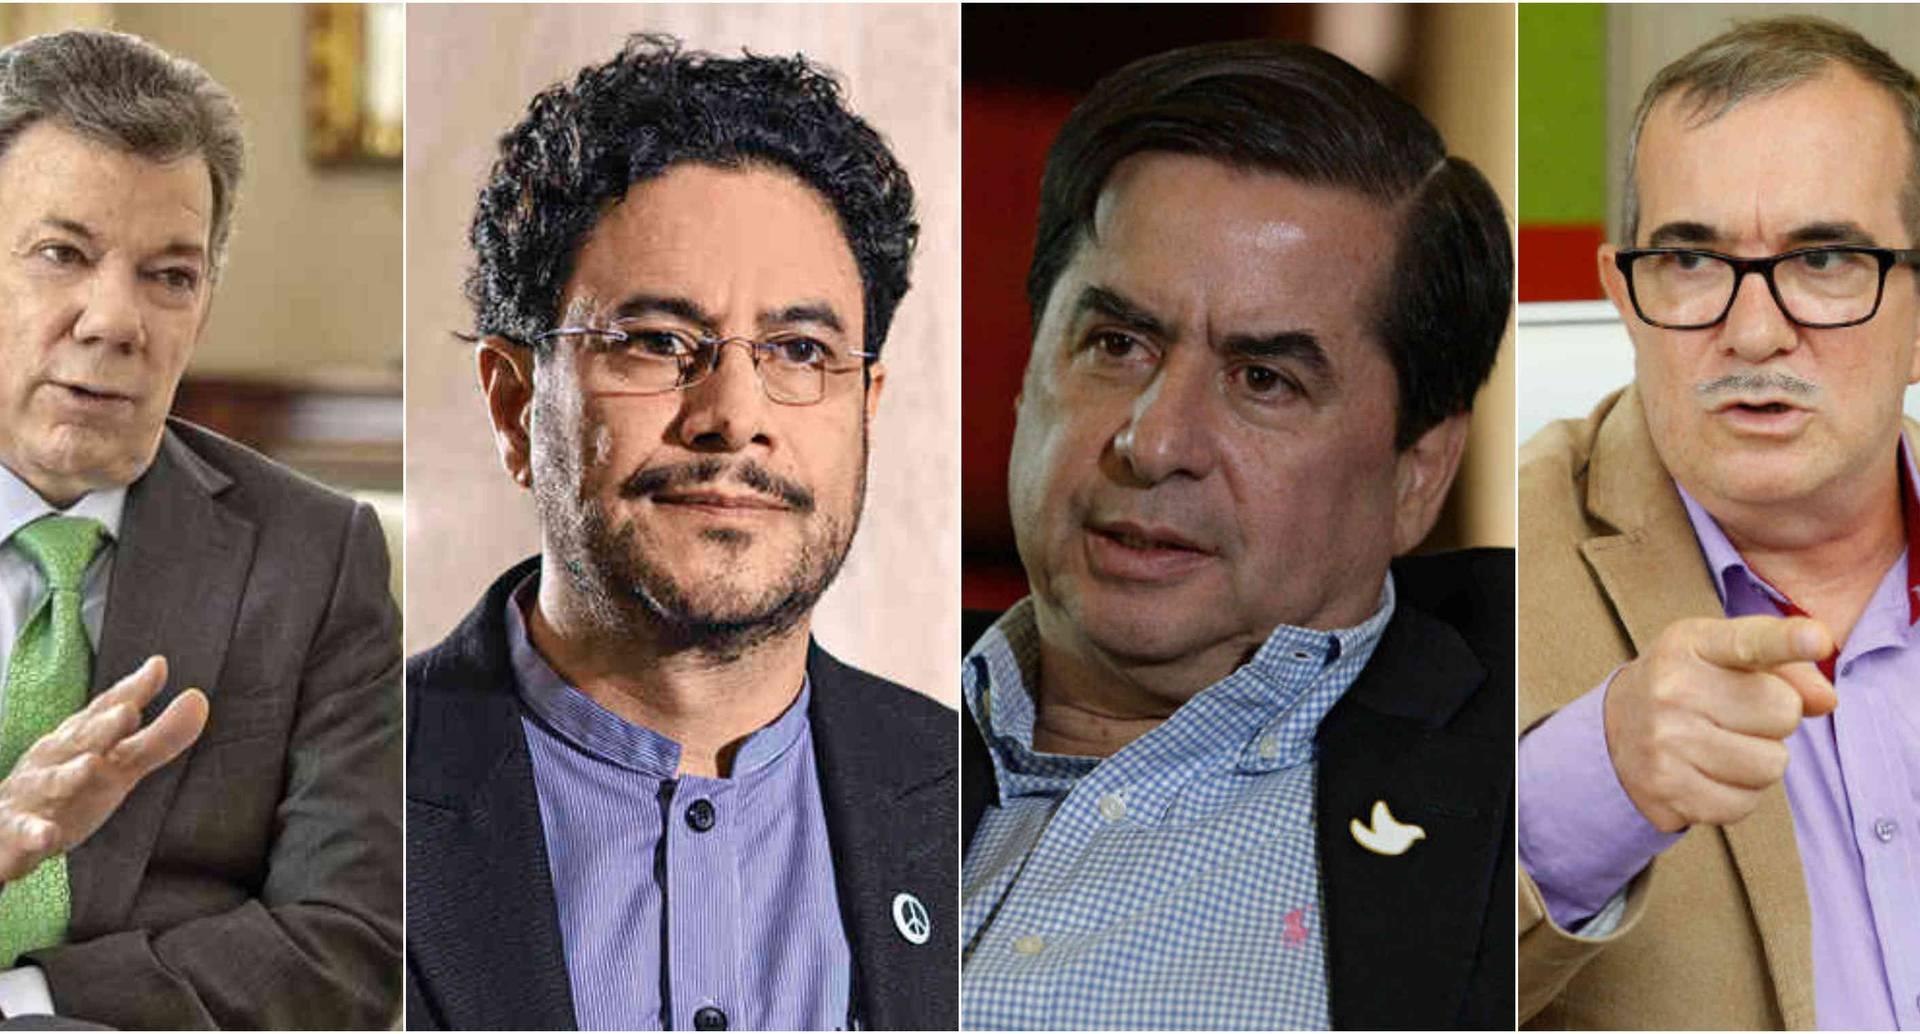 Juan Manuel Santos, Iván Cepeda, Juan Fernando Cristo y Rodrigo Londoño